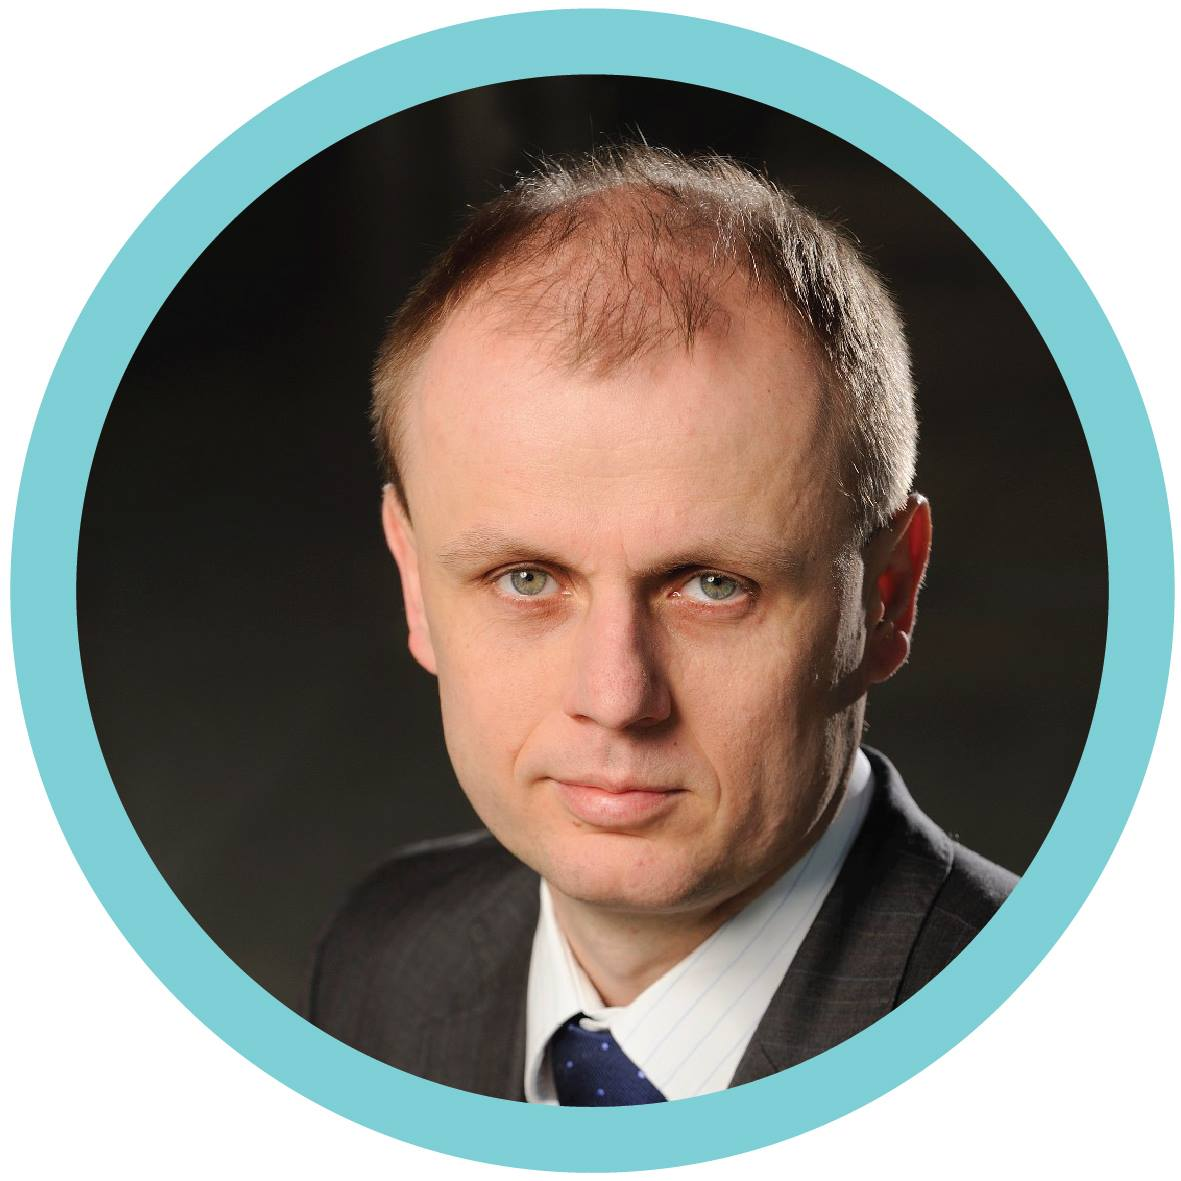 Mariusz Witalis